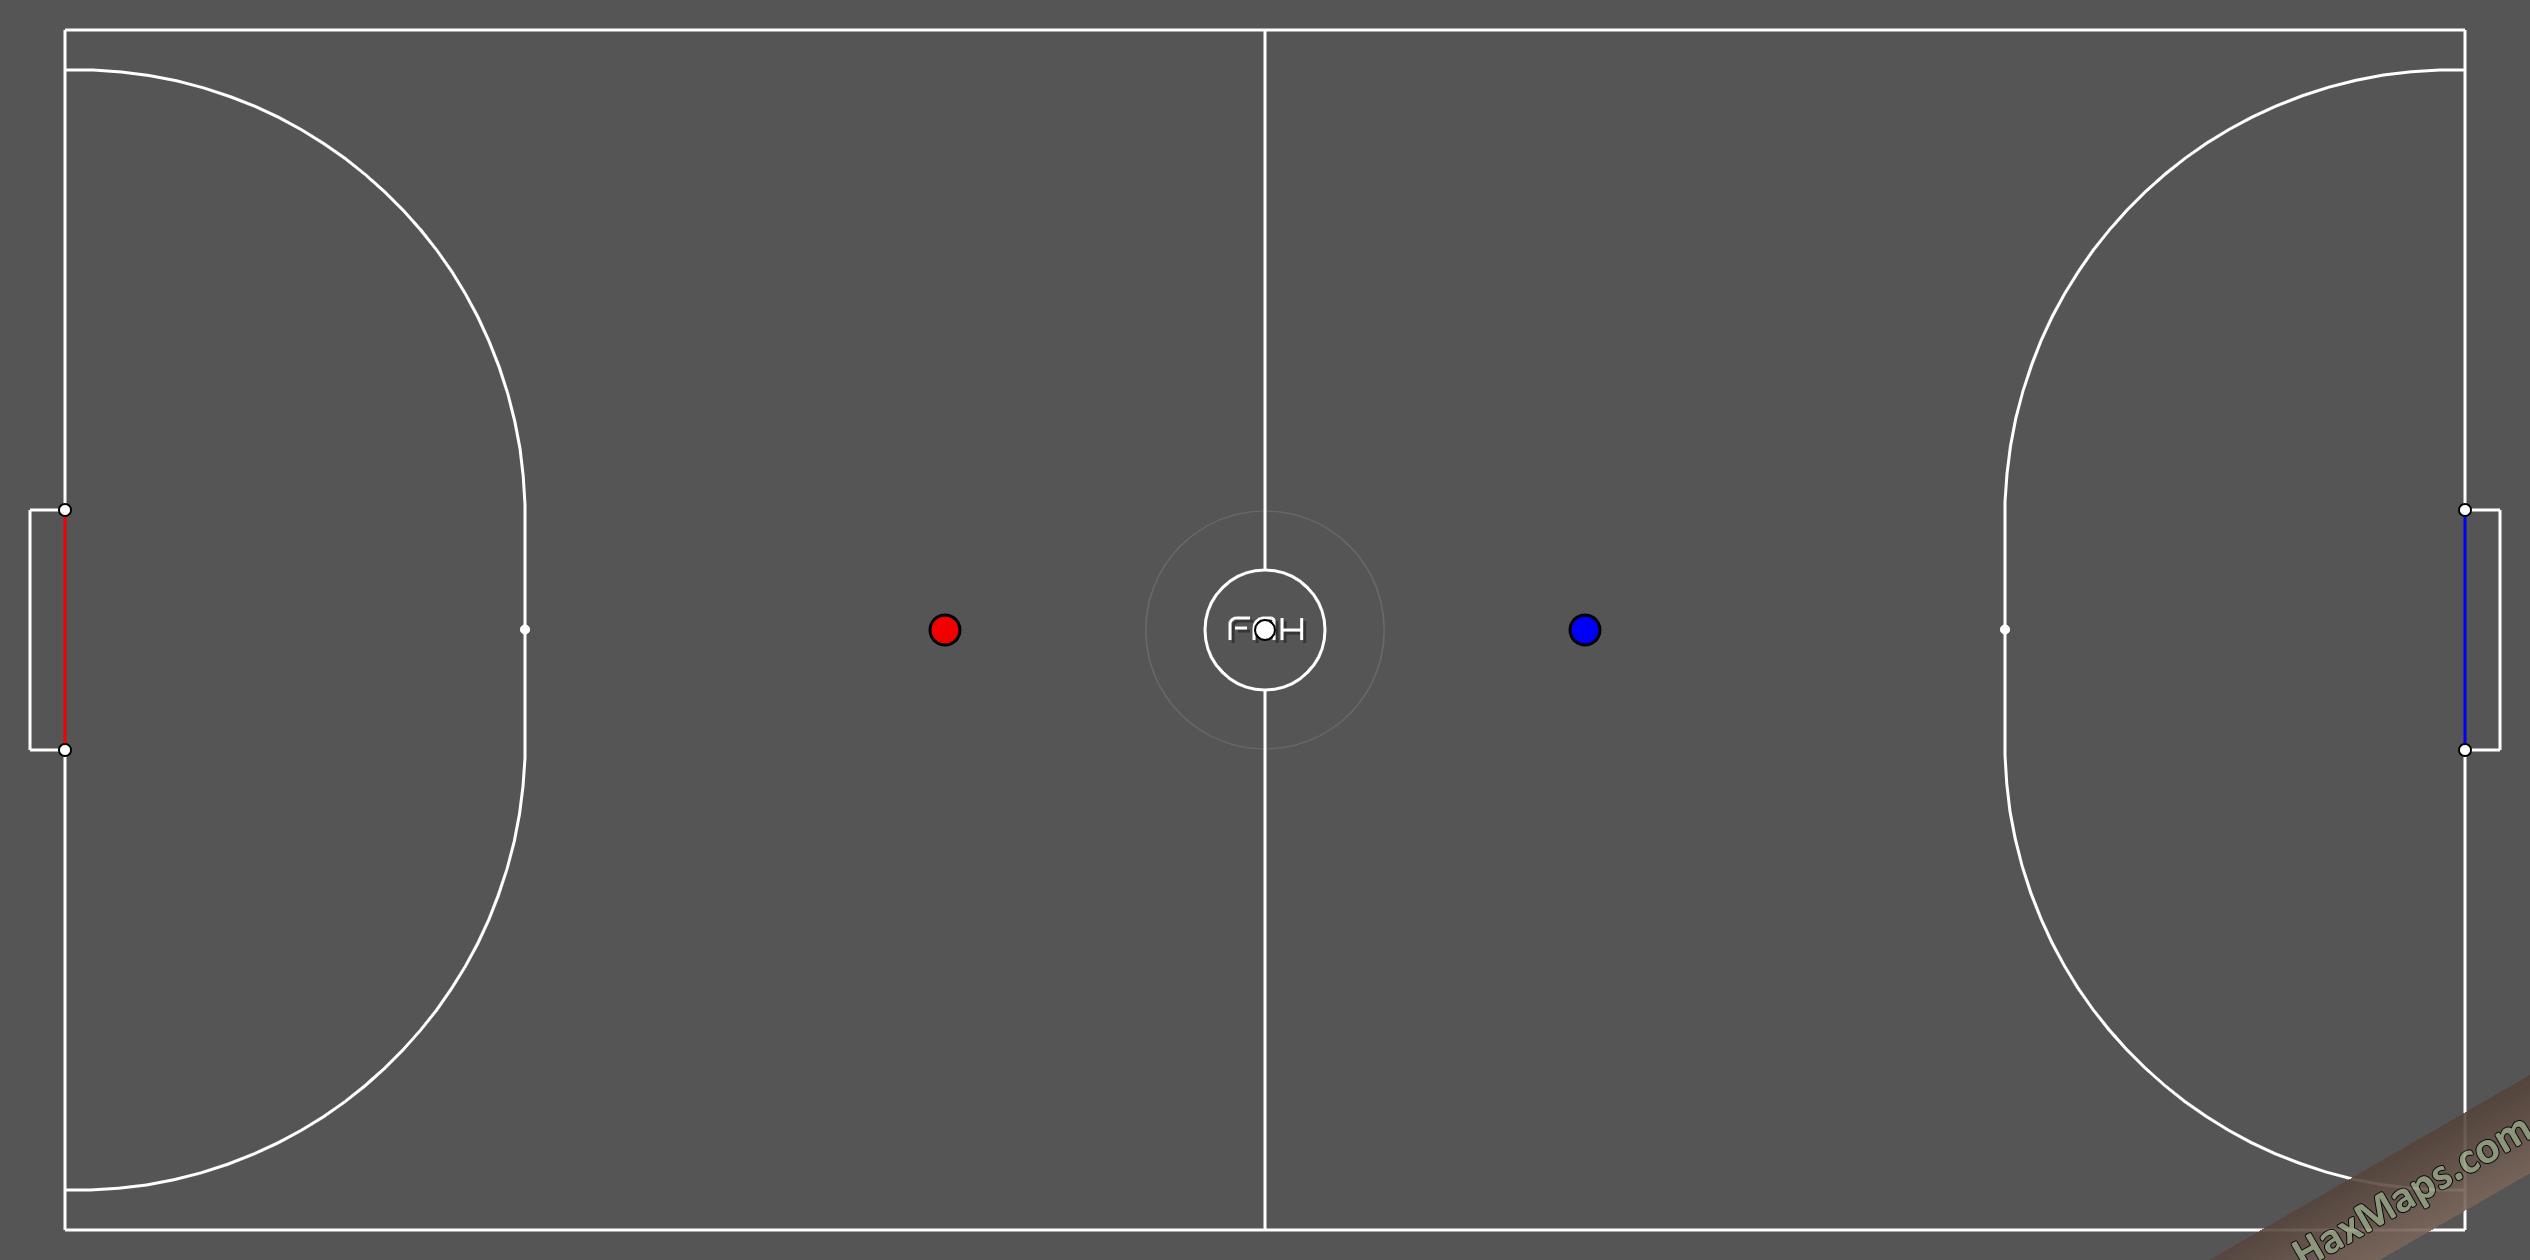 hax ball maps | Futsal X7 by FAH